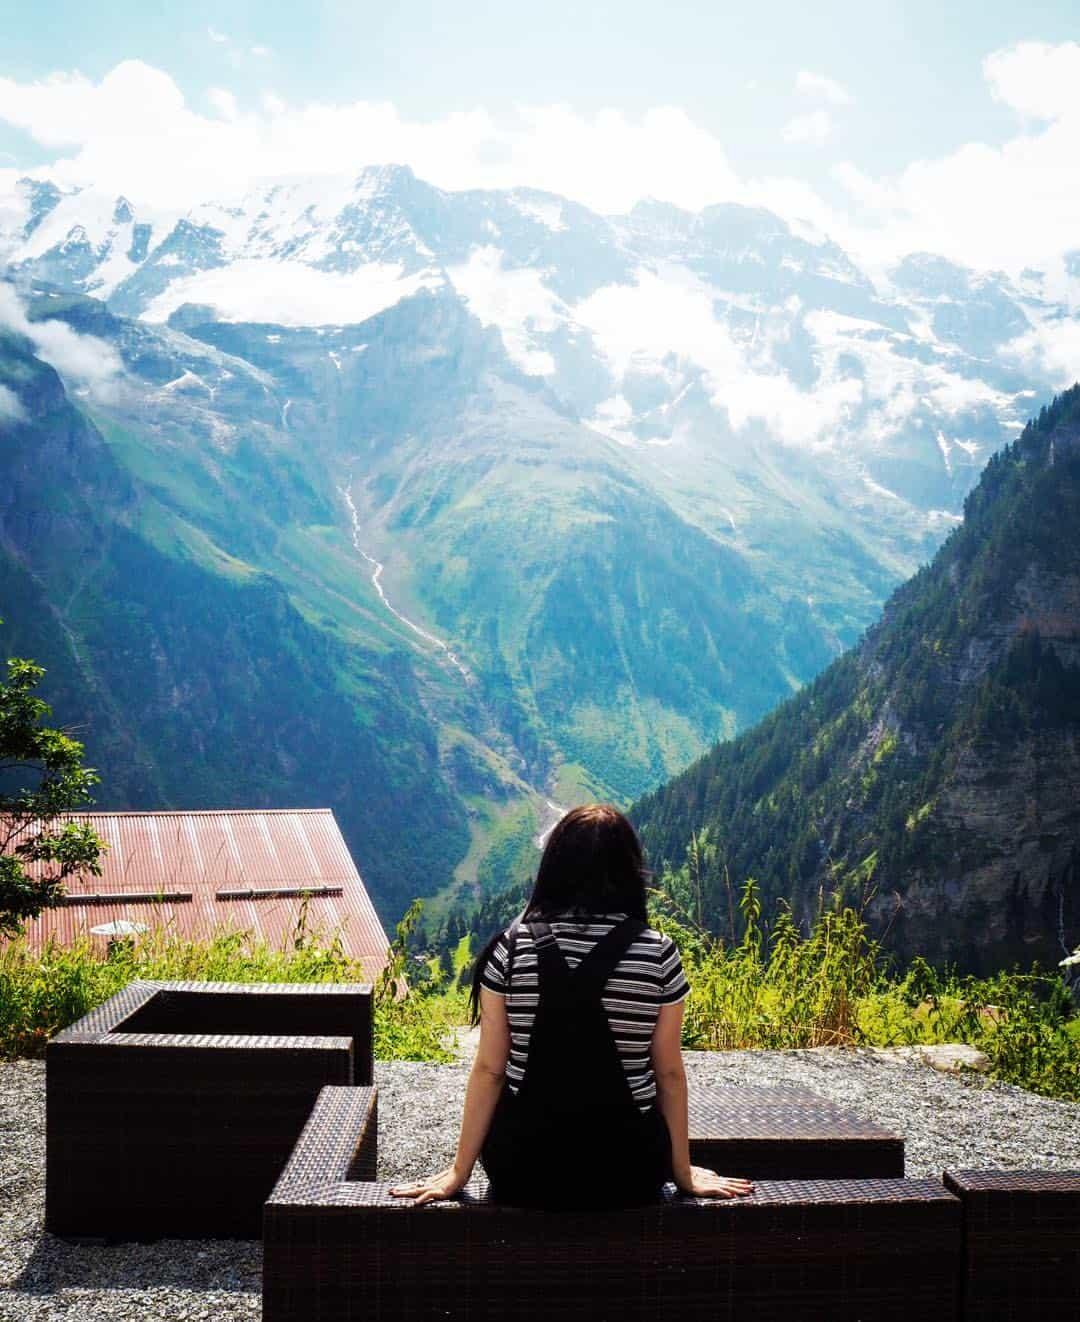 Gimmelwald Switzerland | Almendhubel